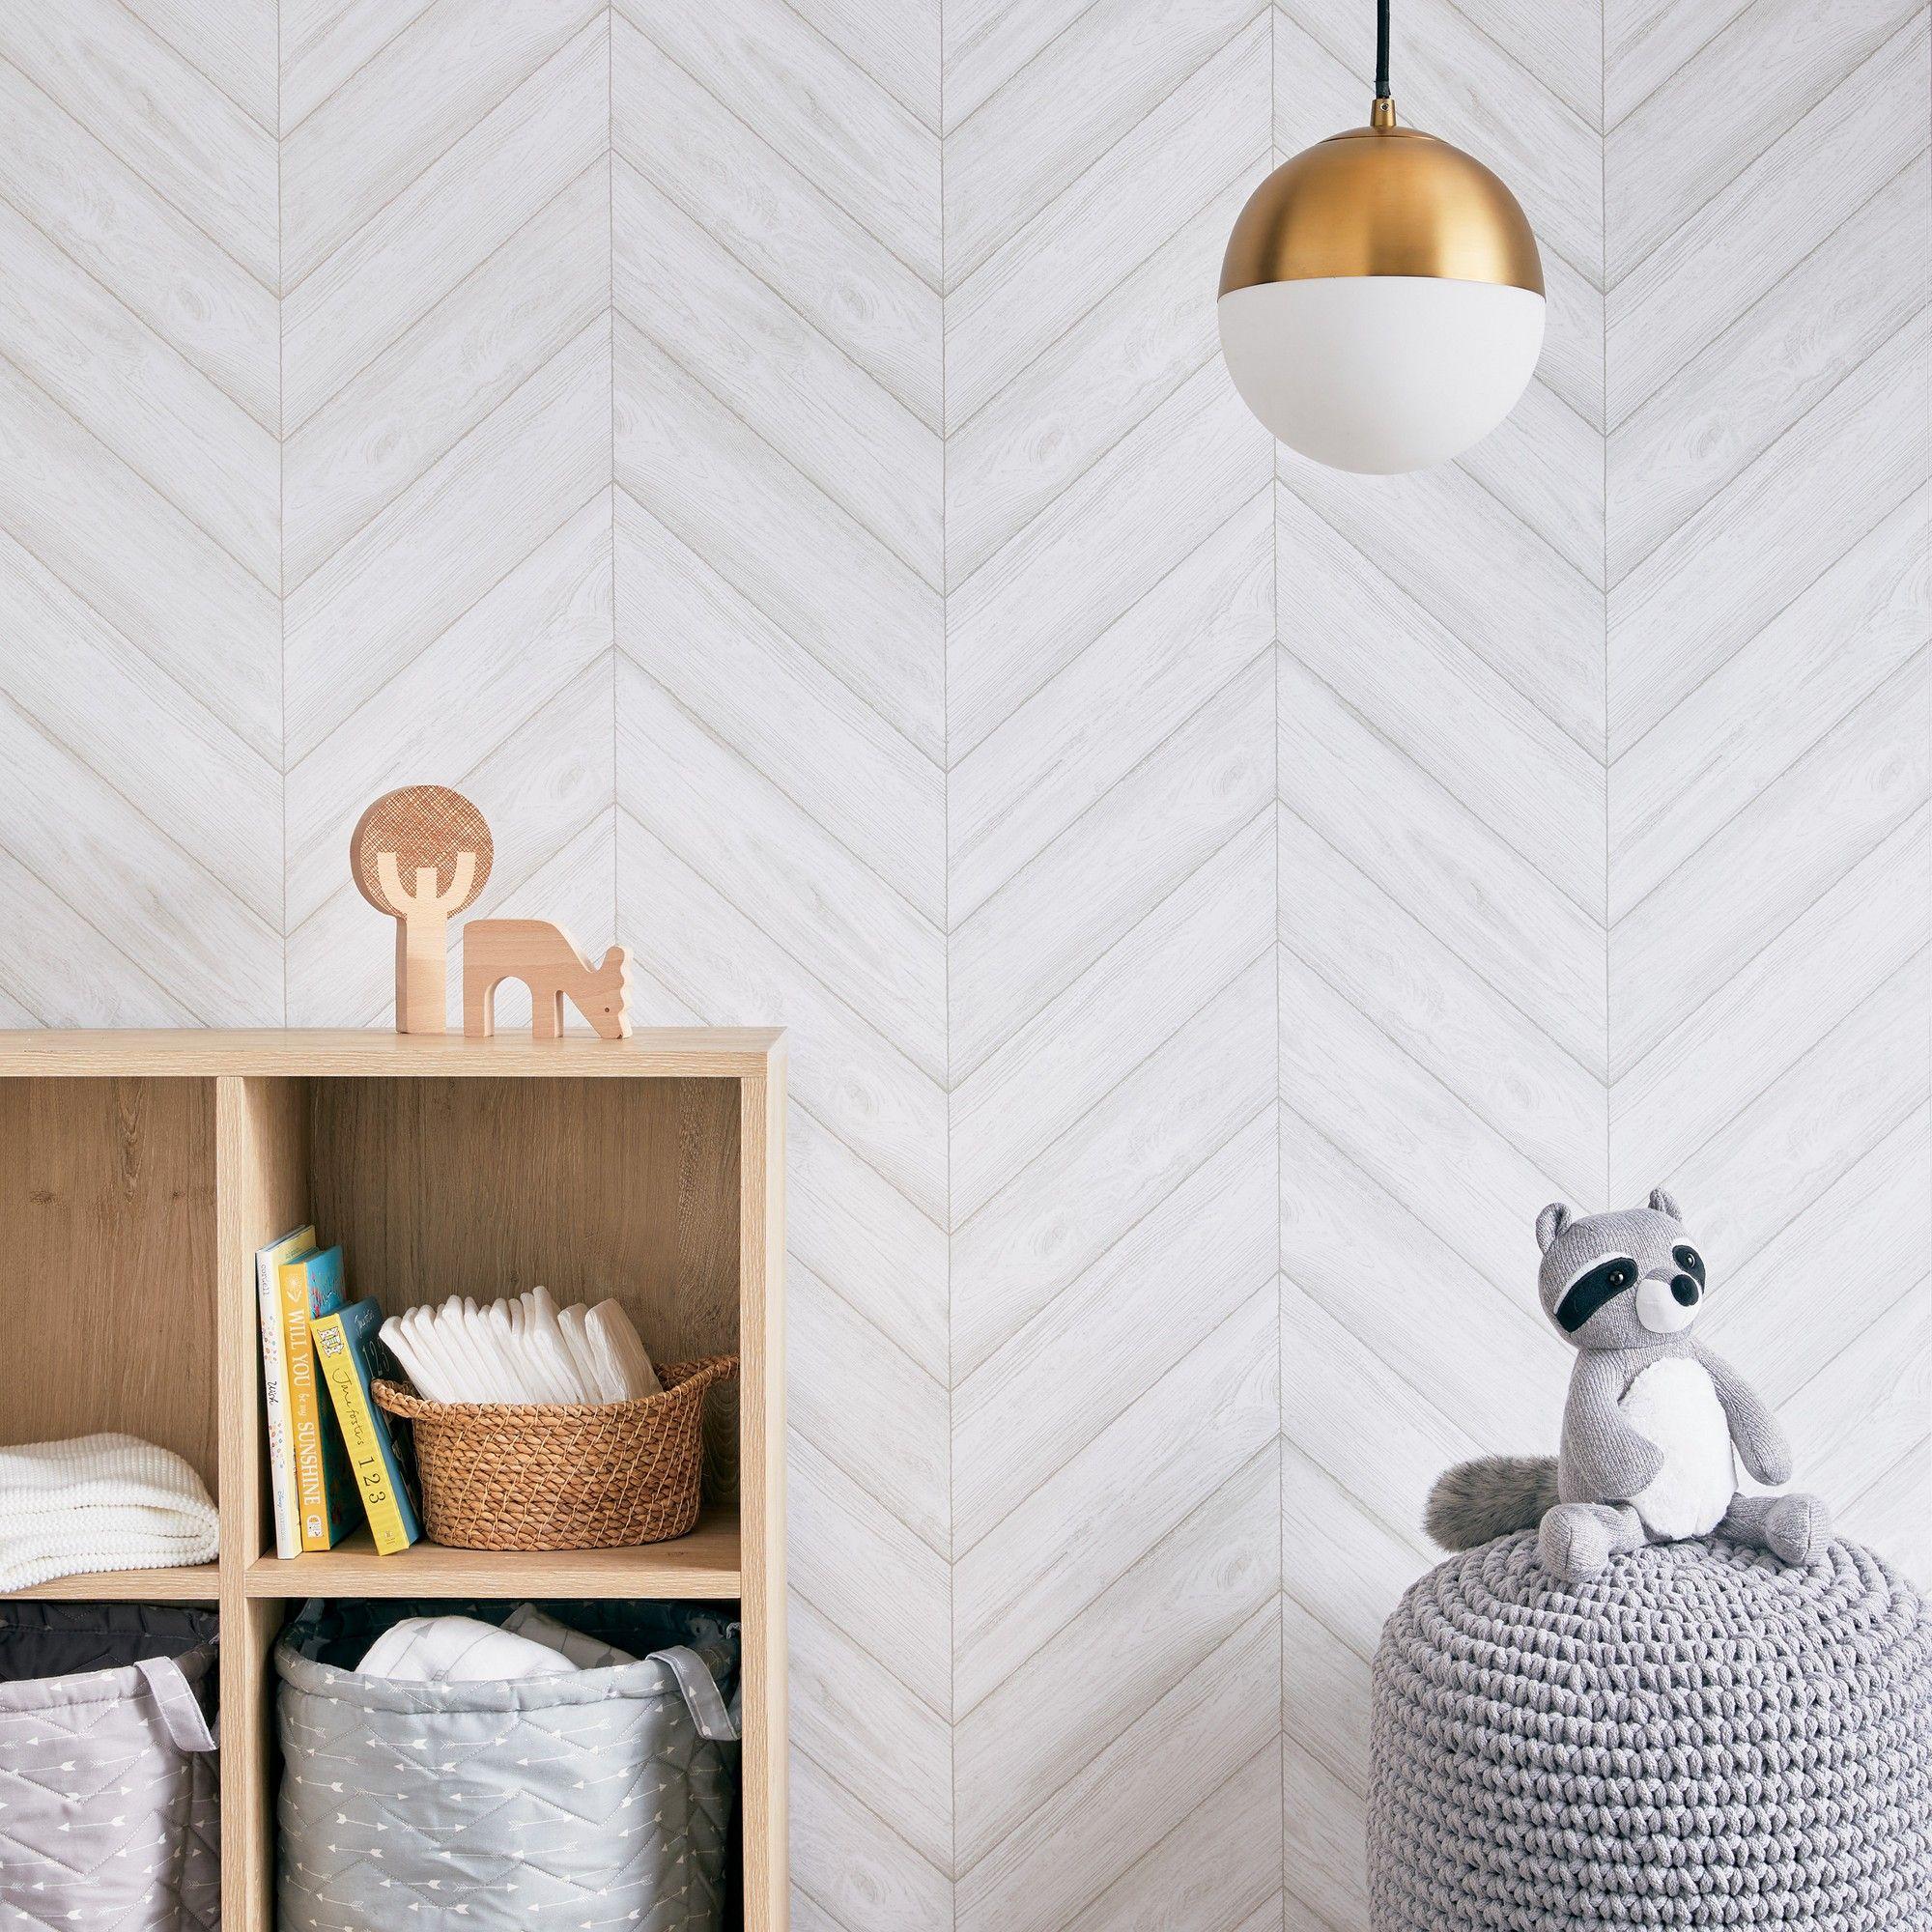 Peel Stick Wallpaper Textured Herringbone Gray Cloud Island Peel And Stick Wallpaper Herringbone Wallpaper Textured Wallpaper